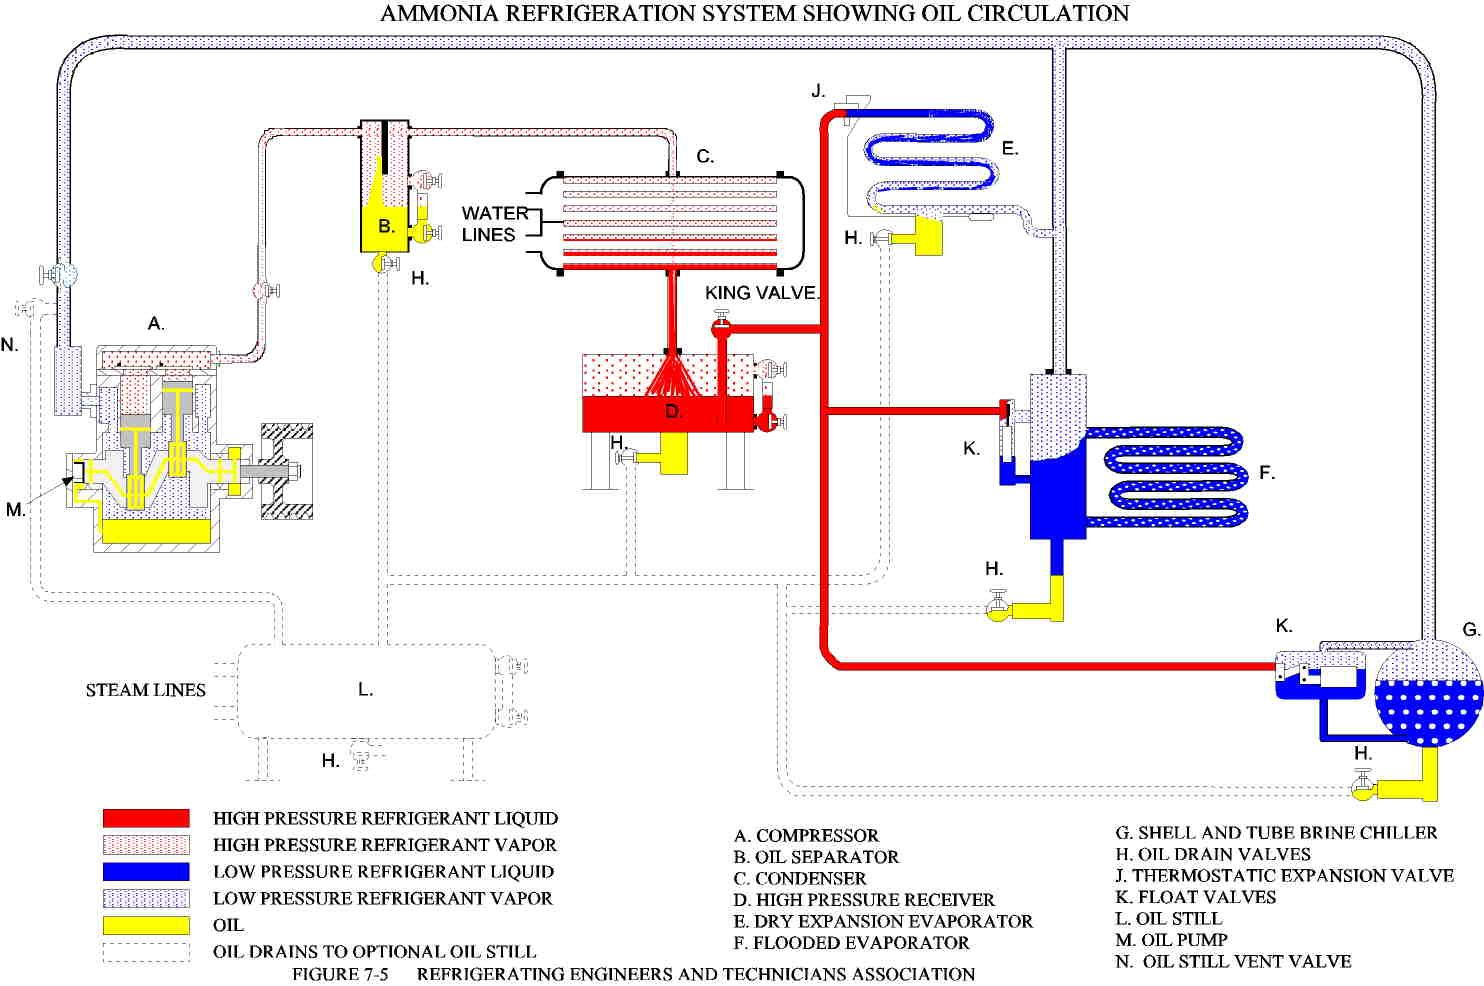 How A Freezer Works Diagram Delco Alternator Wiring External Regulator Ammonia Refrigeration System Google Search Hvac R 기술